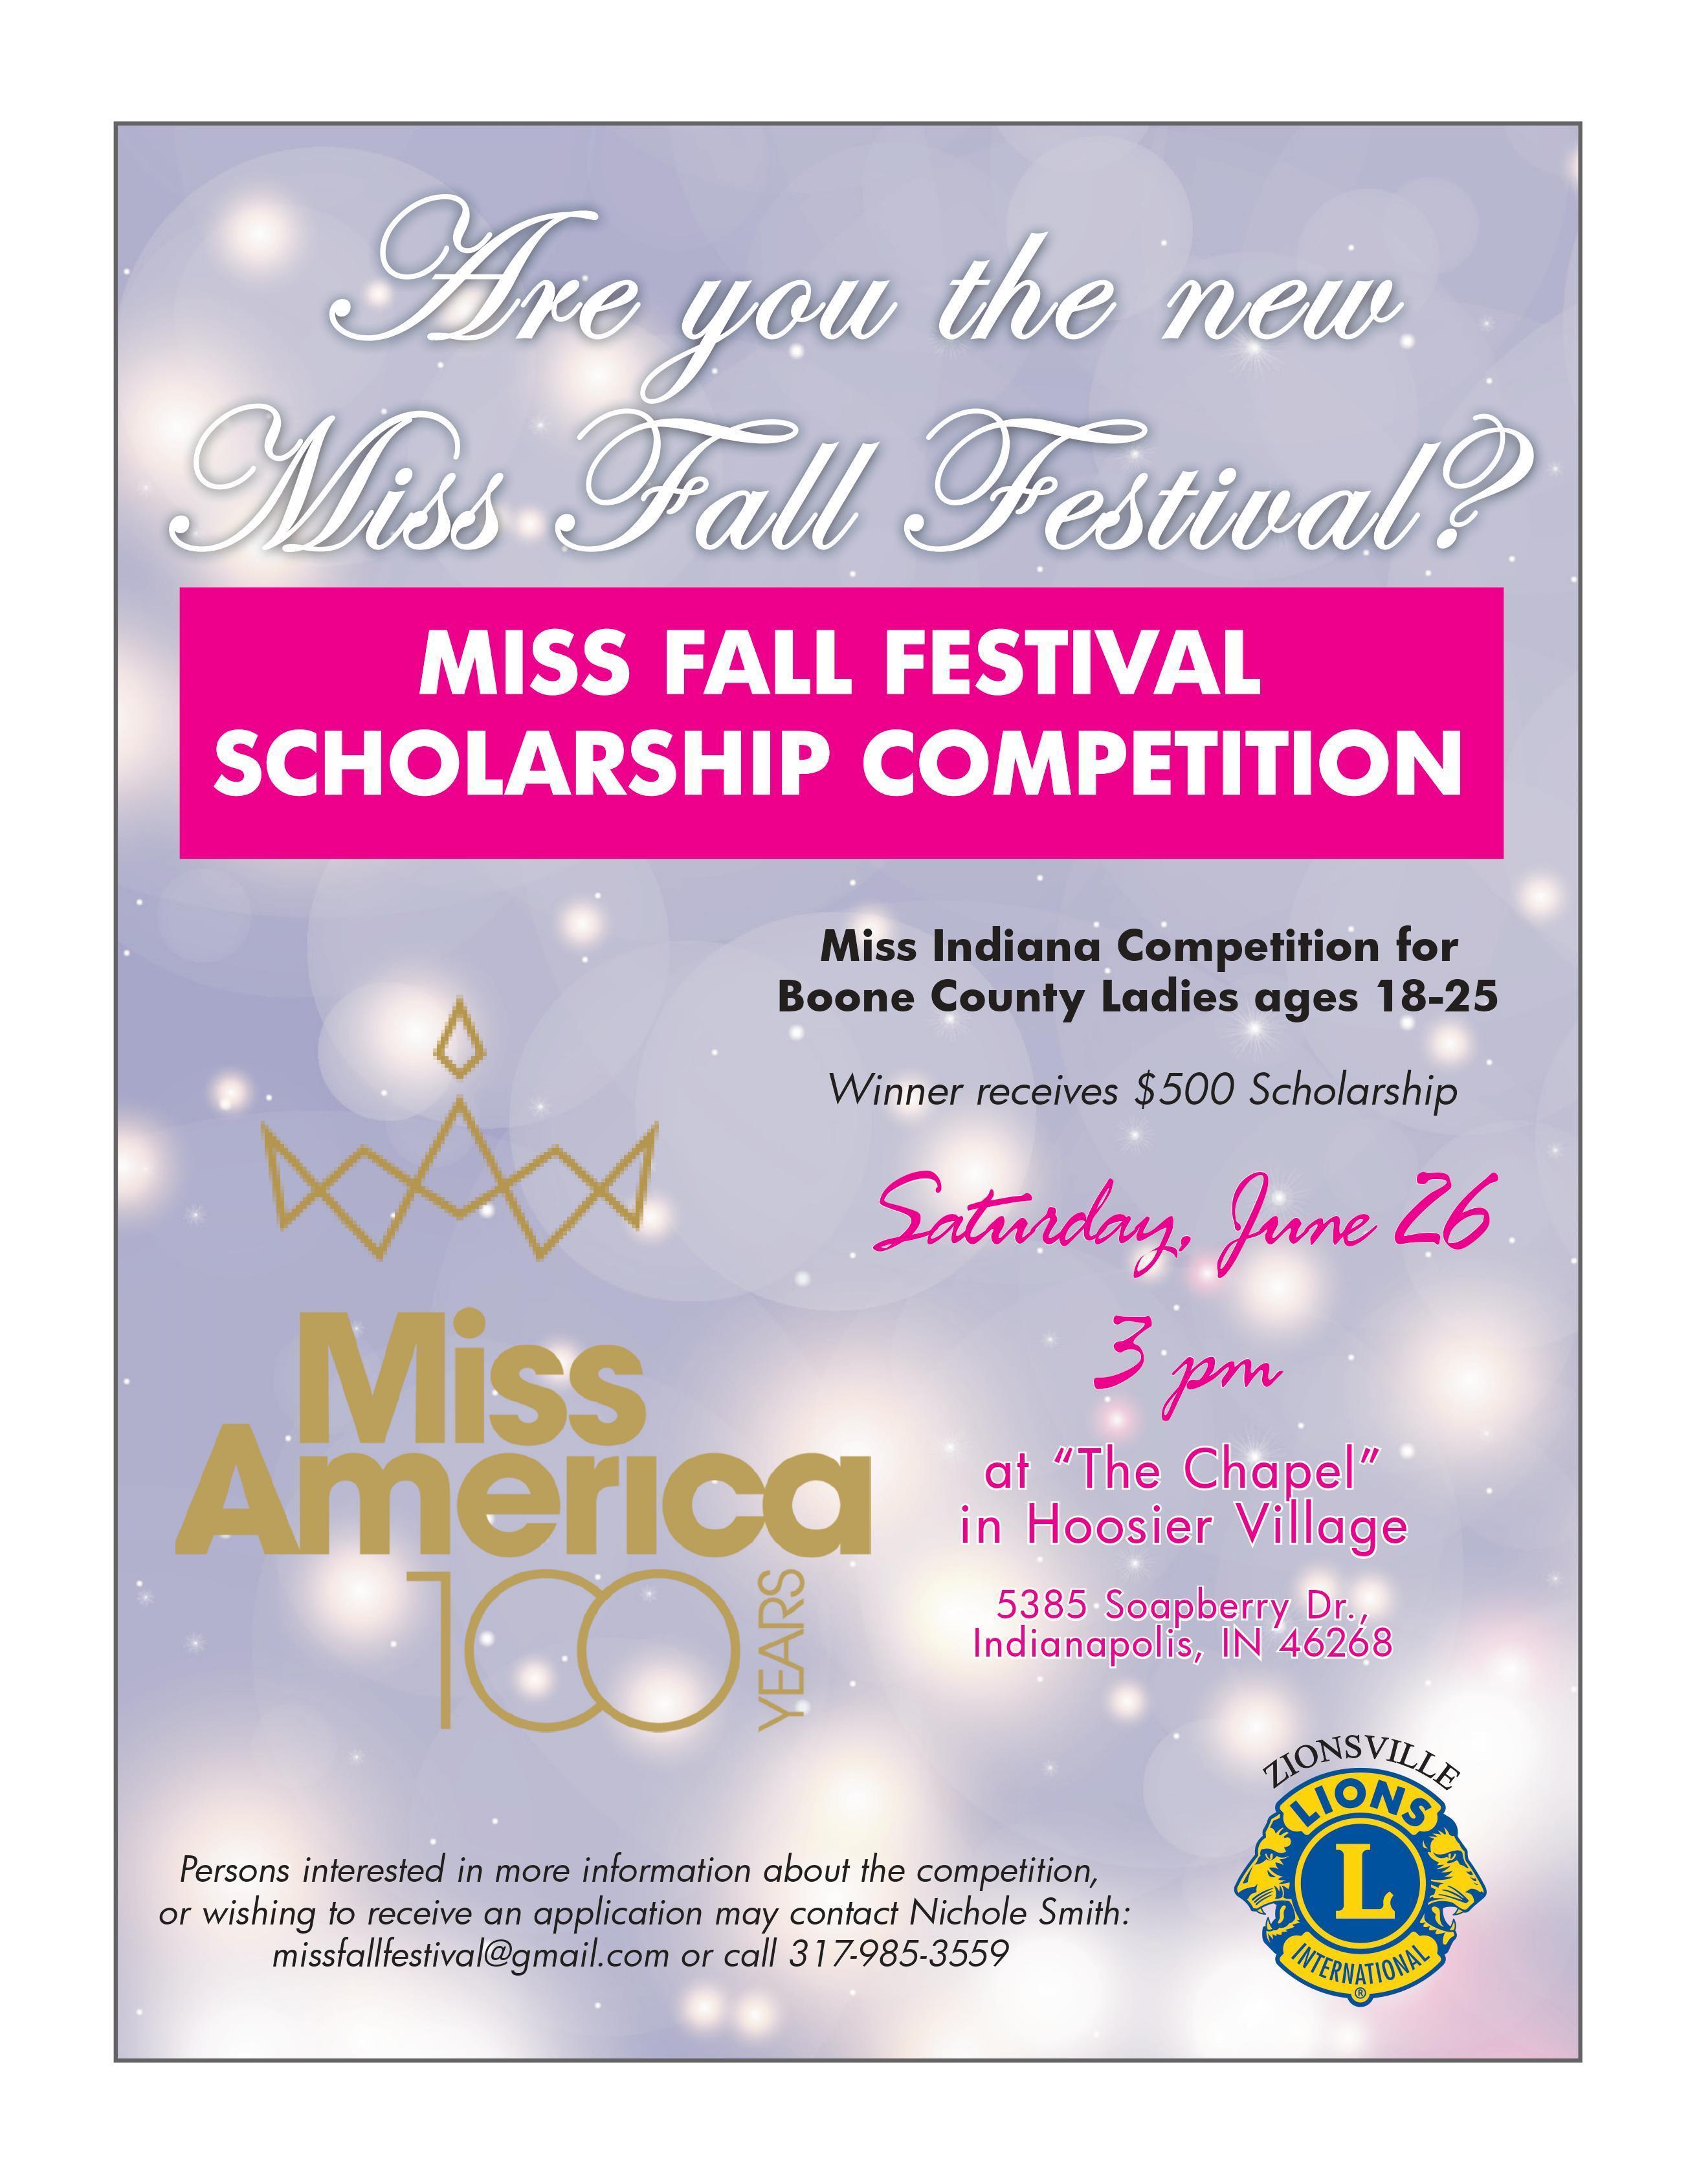 Miss Fall Festival Scholarship